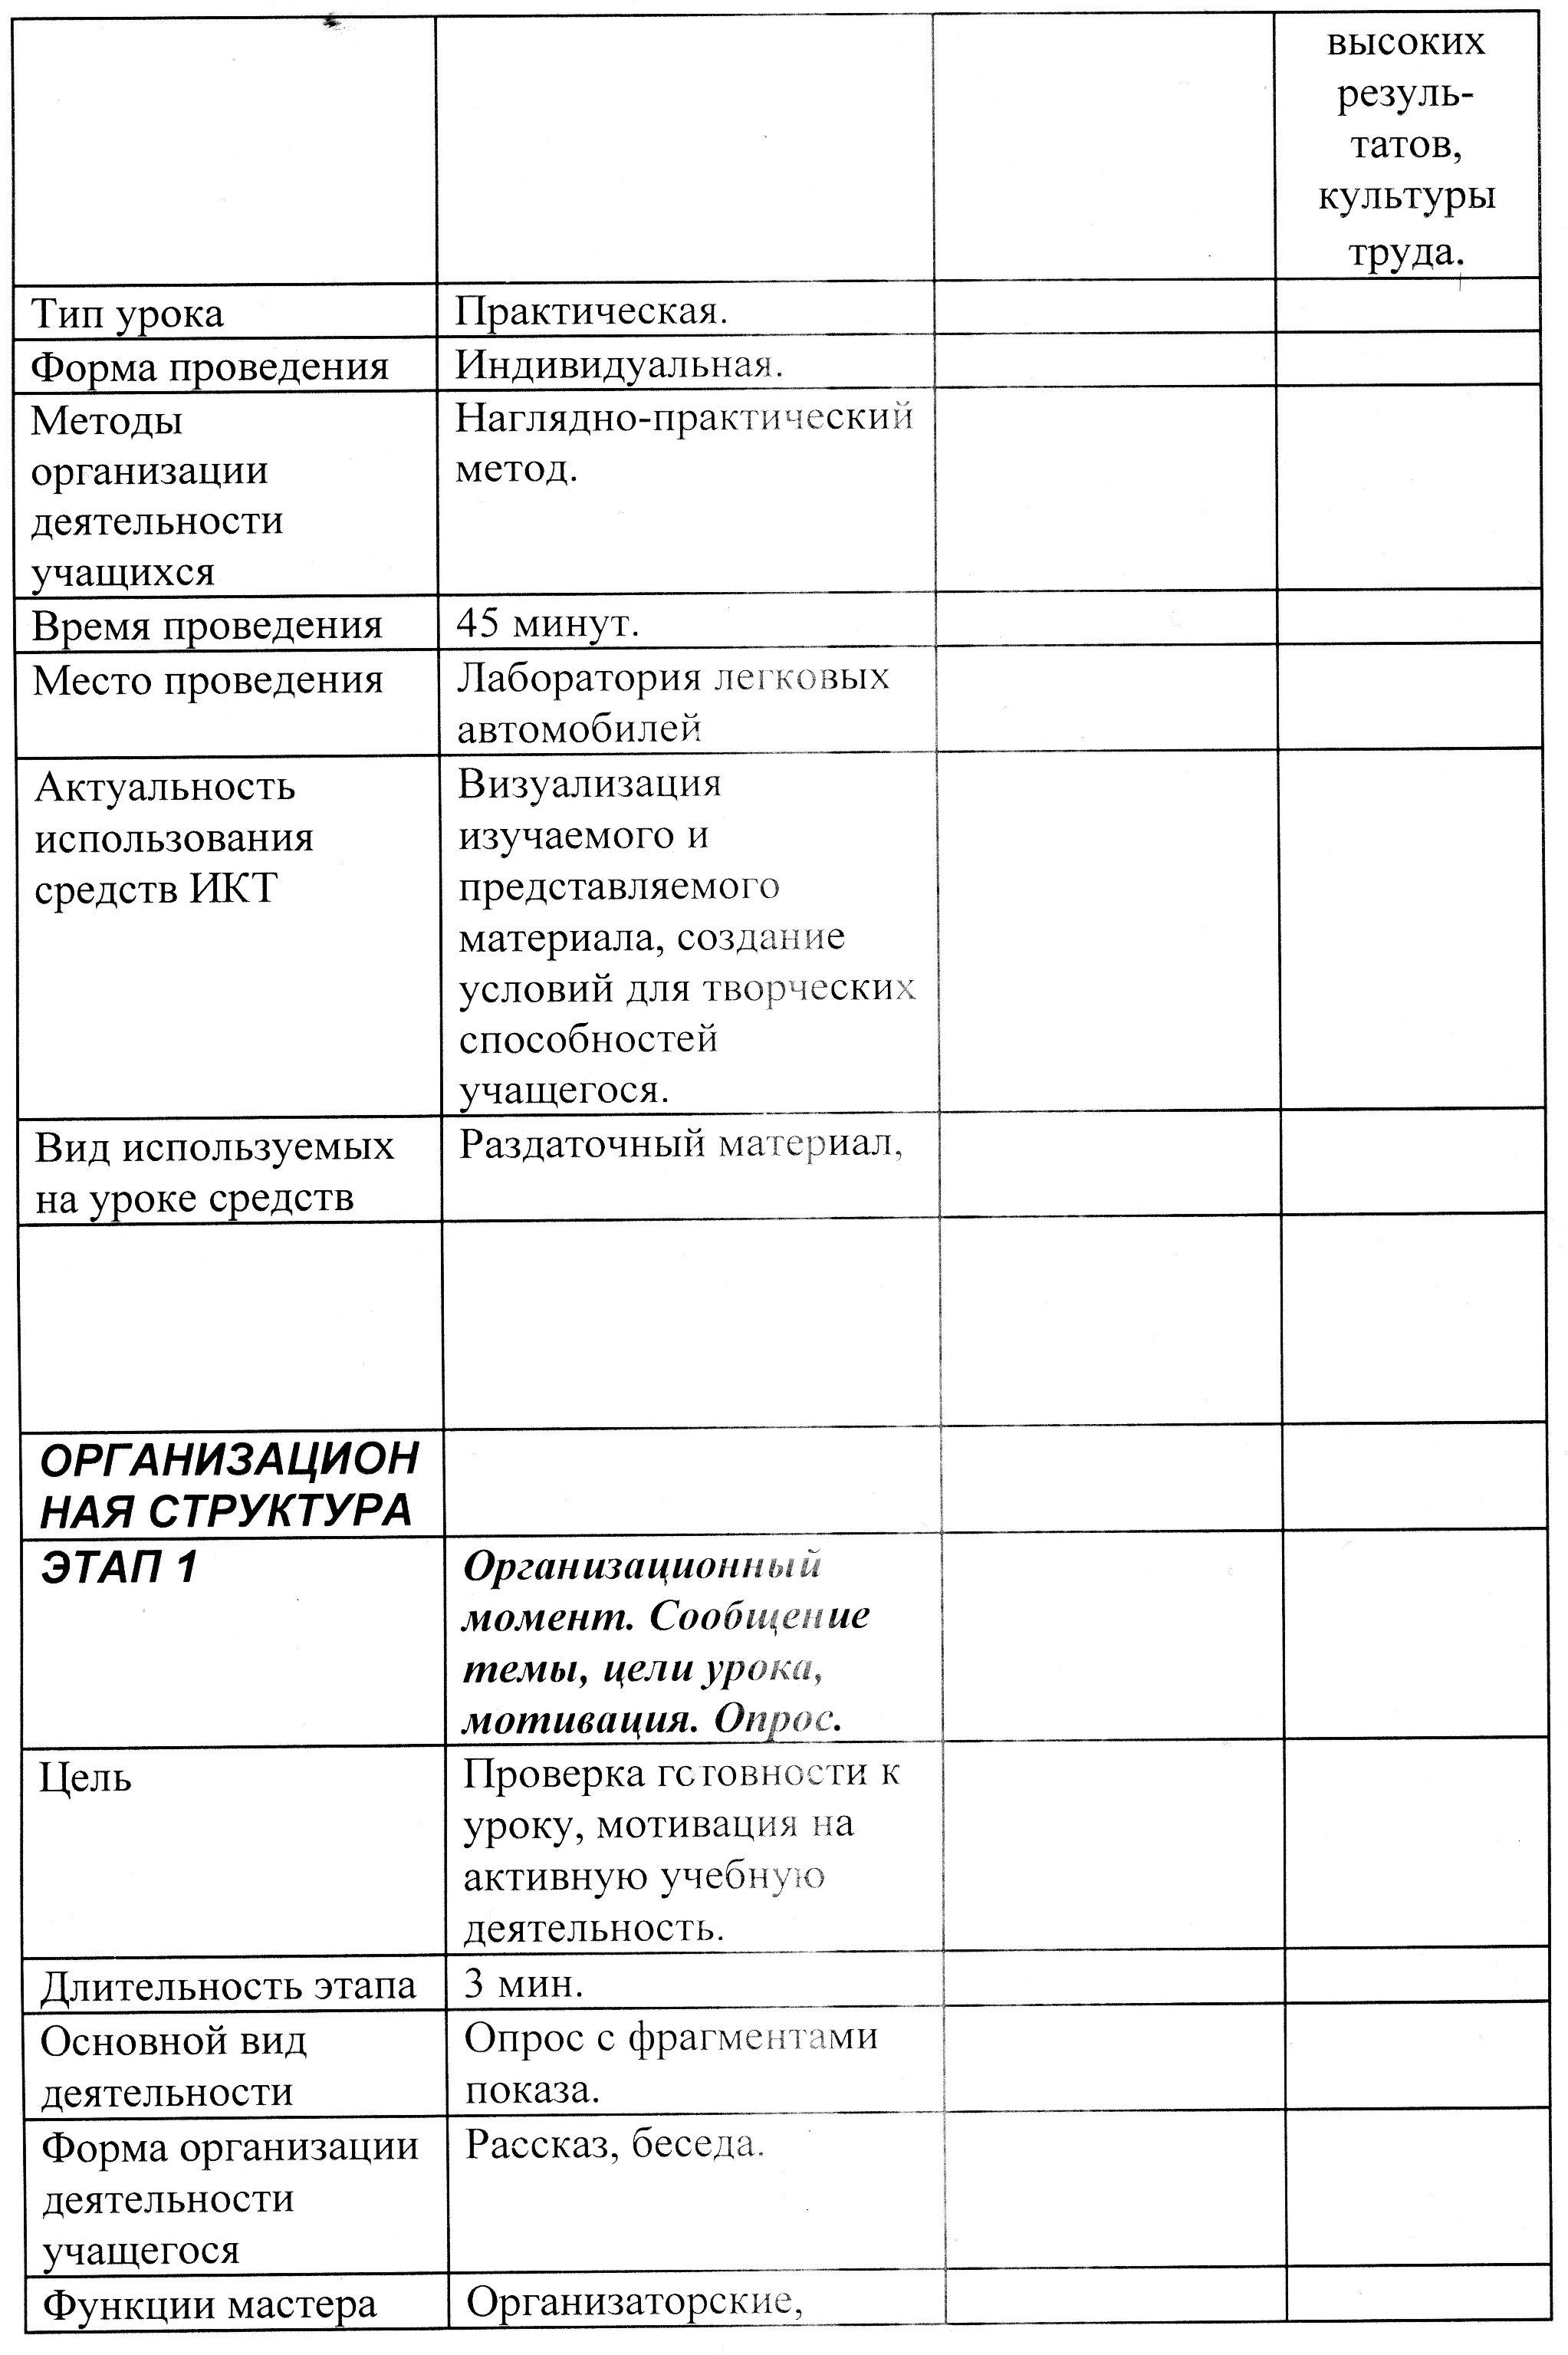 C:\Users\Василий Мельченко\Pictures\img624.jpg